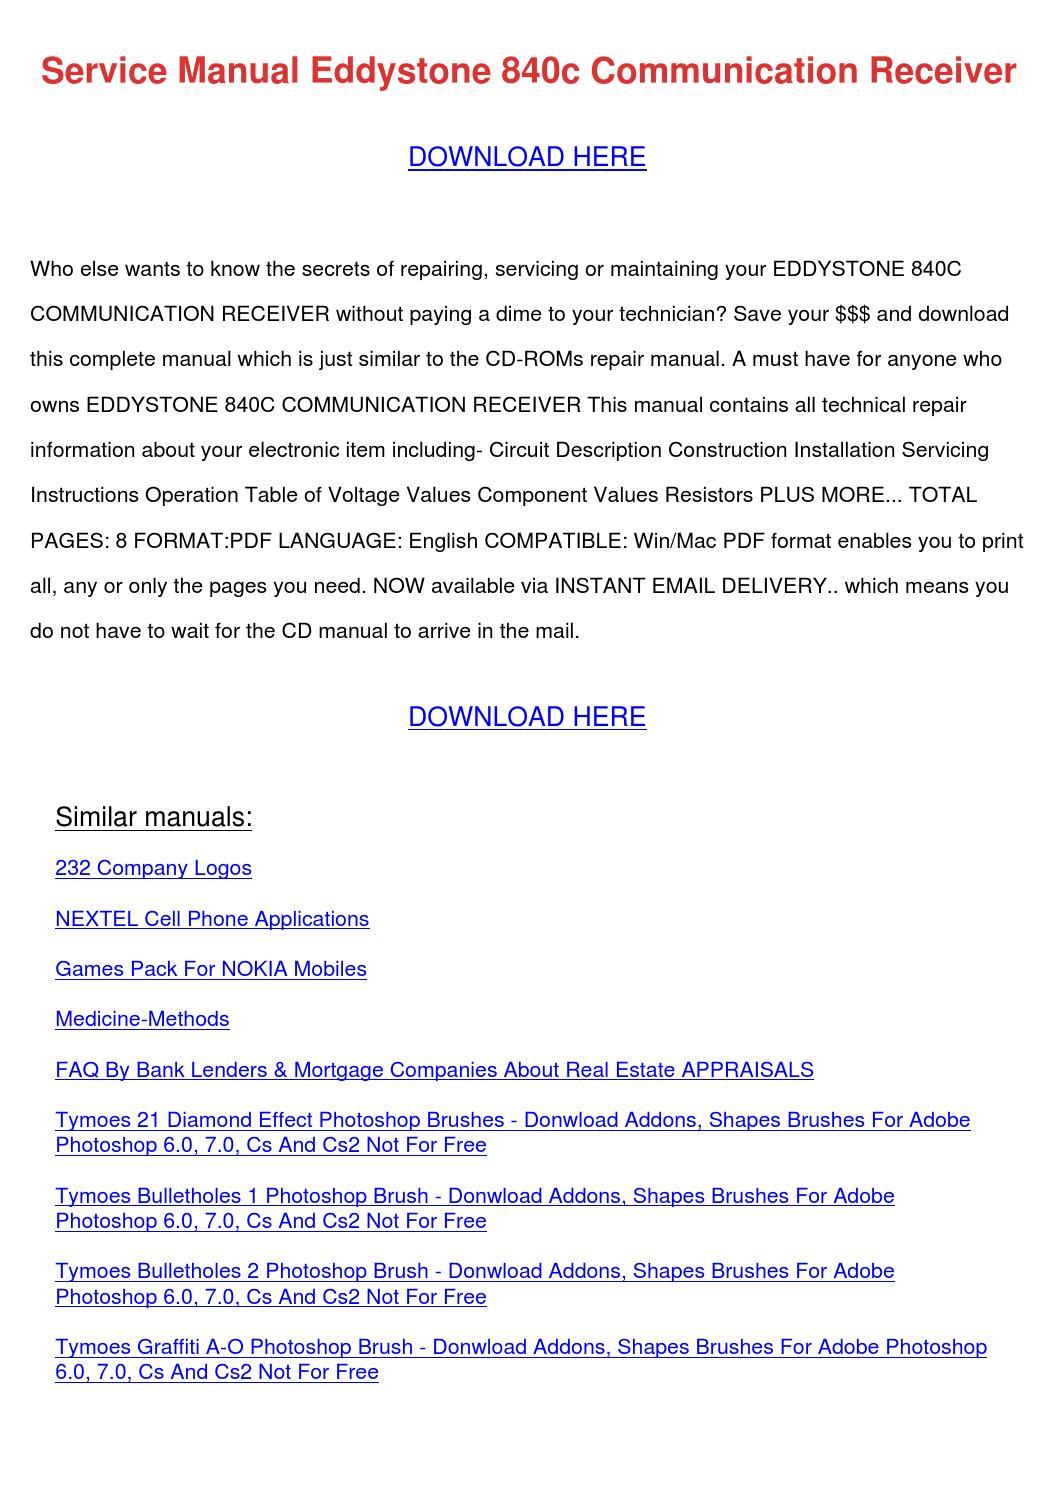 Cambridge 840c service manual – Free Download, Herunterladen Kostenlos